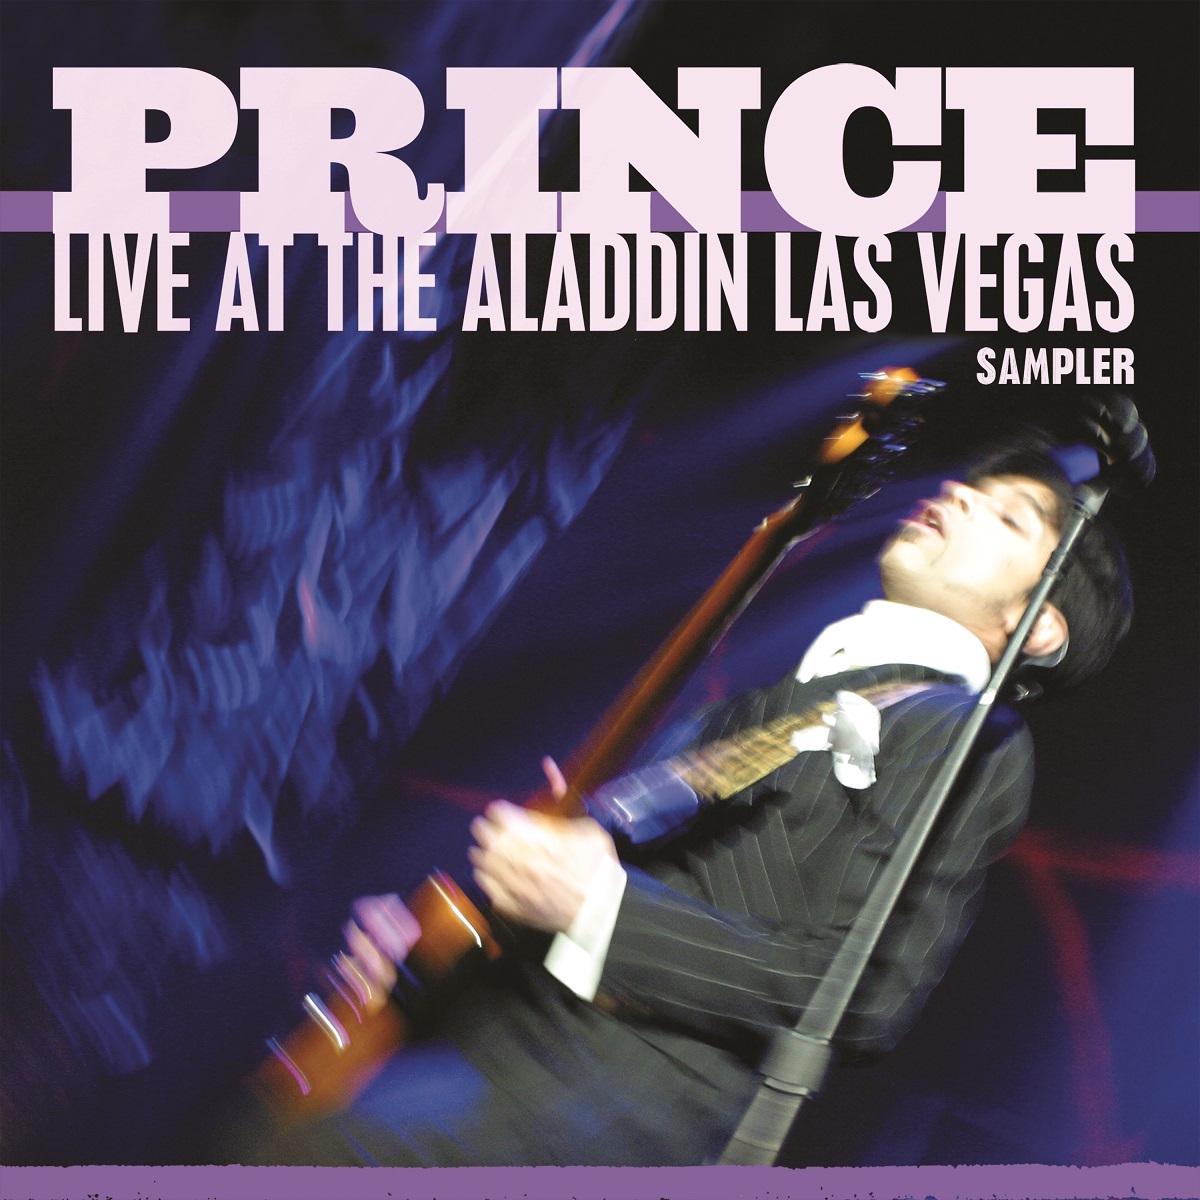 prince live aladdin sampler stream release Princes Rare Live at the Aladdin Las Vegas Sampler Finally Released: Stream